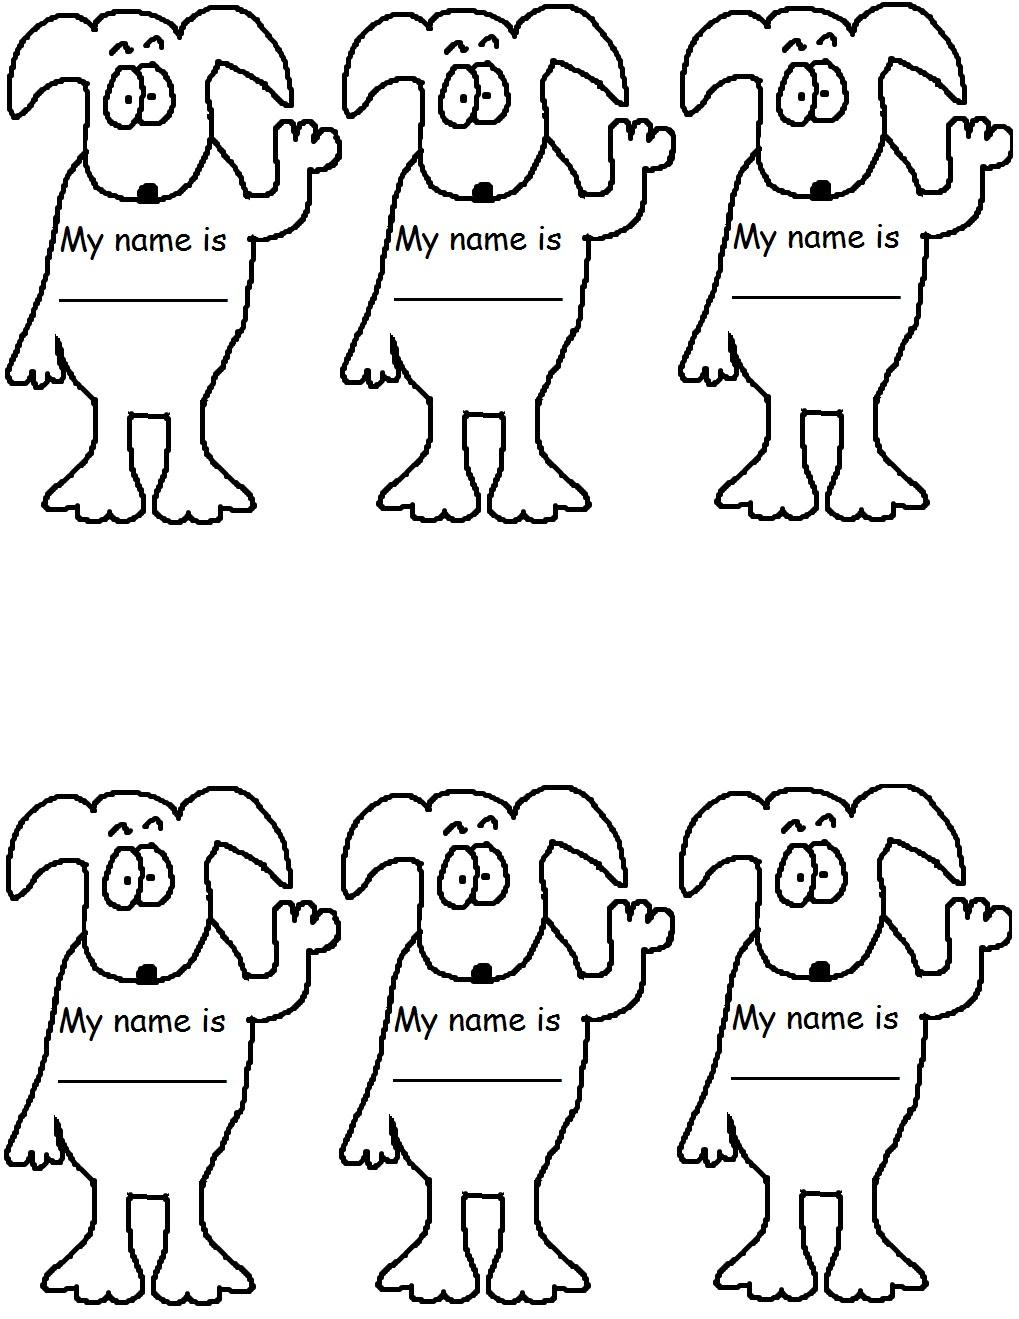 Printable pet tag templates Trials Ireland